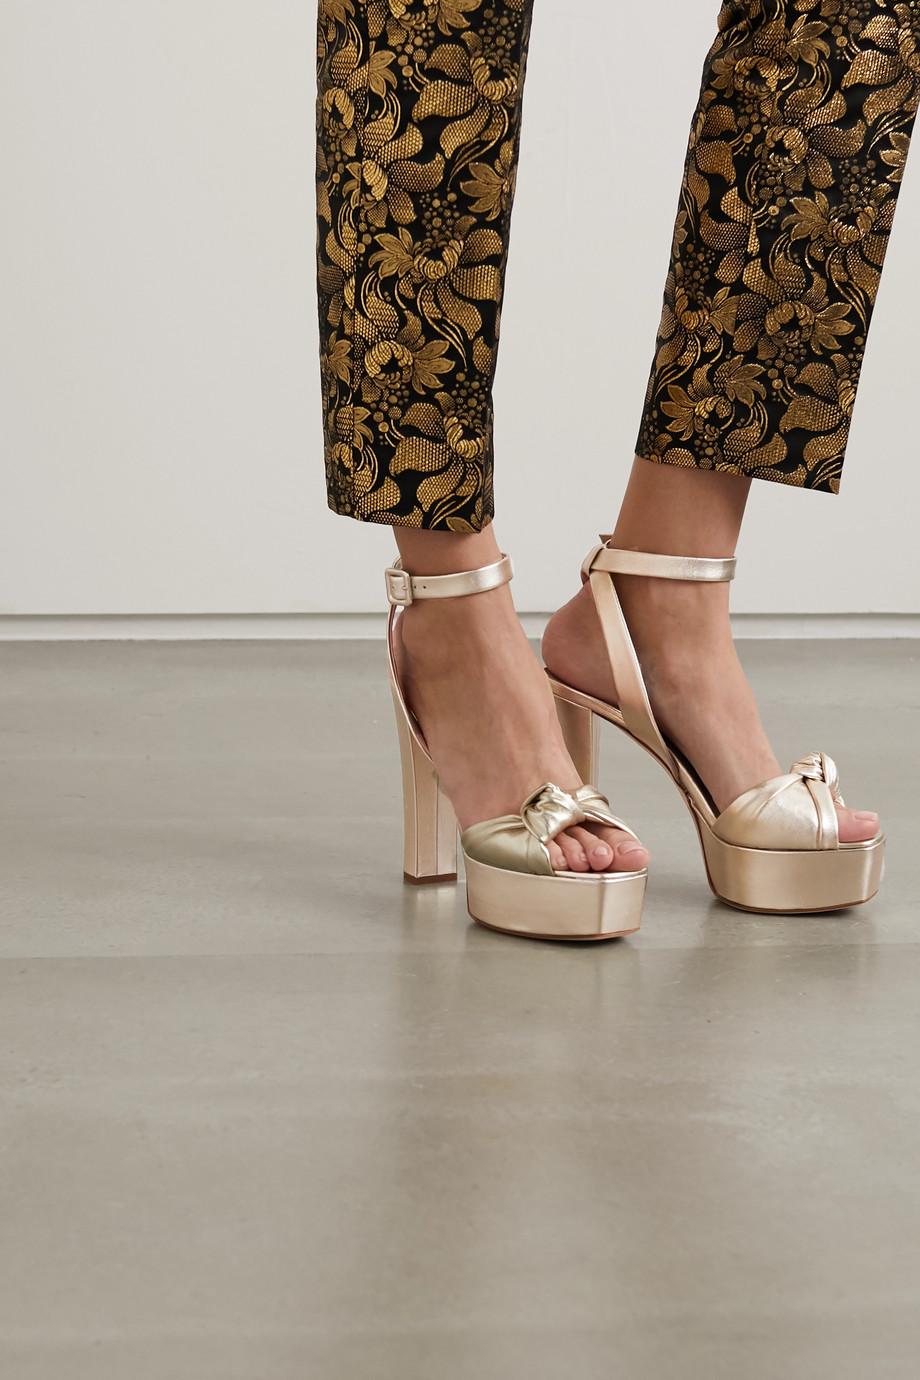 Giuseppe Zanotti Knotted metallic leather platform sandals